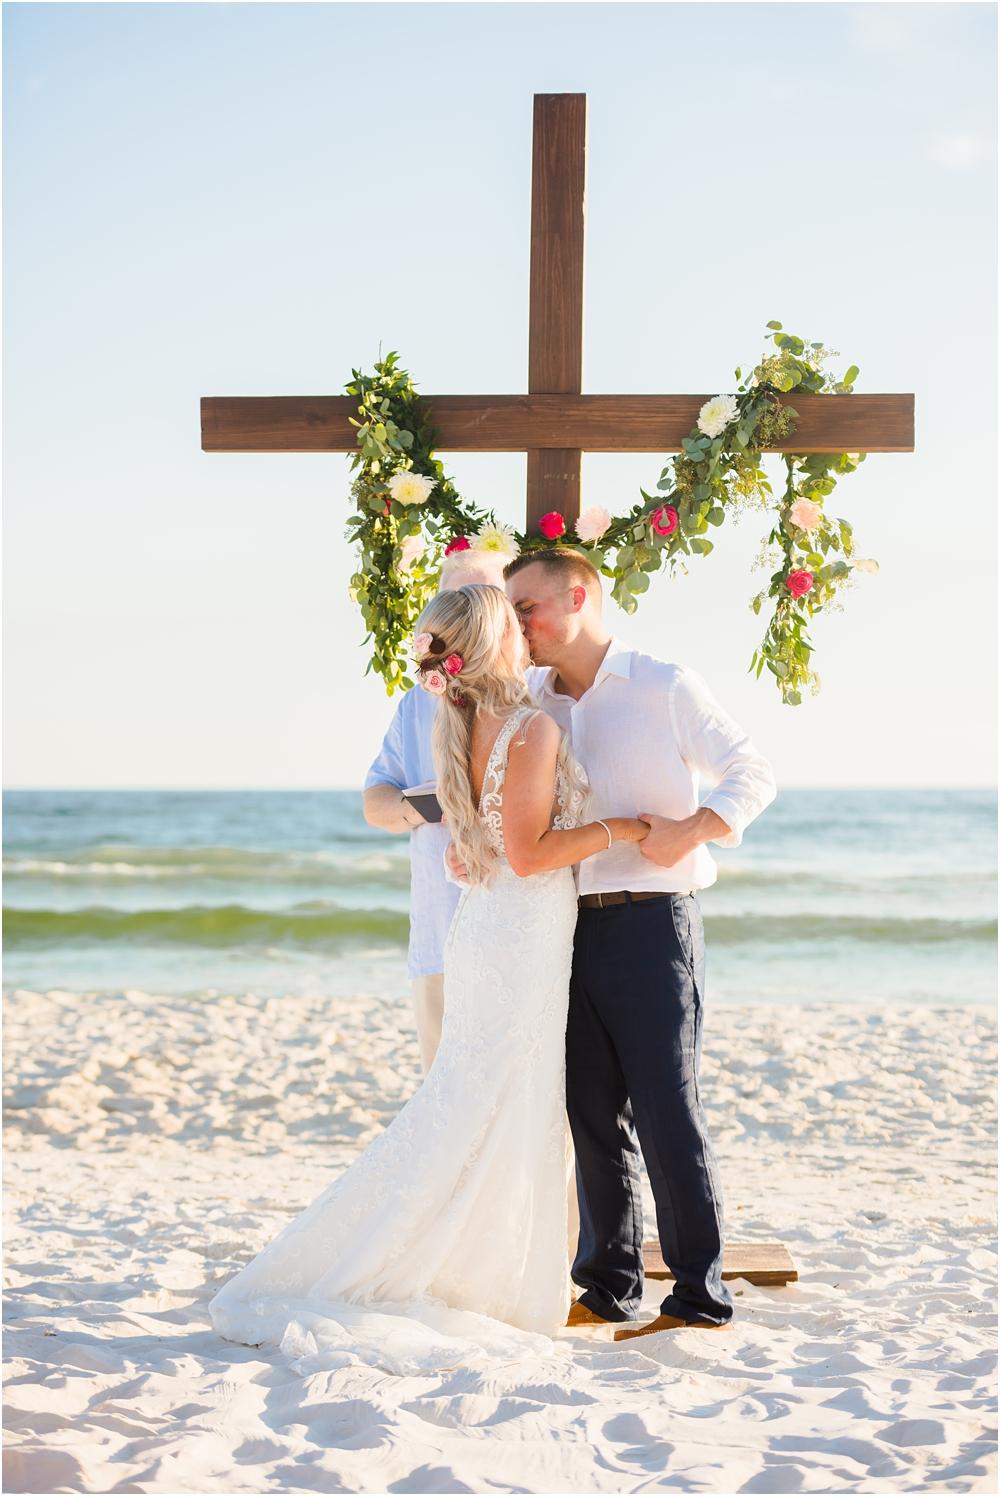 mcglothlin-wedding-kiersten-stevenson-photography-30a-panama-city-beach-dothan-tallahassee-(90-of-145).jpg